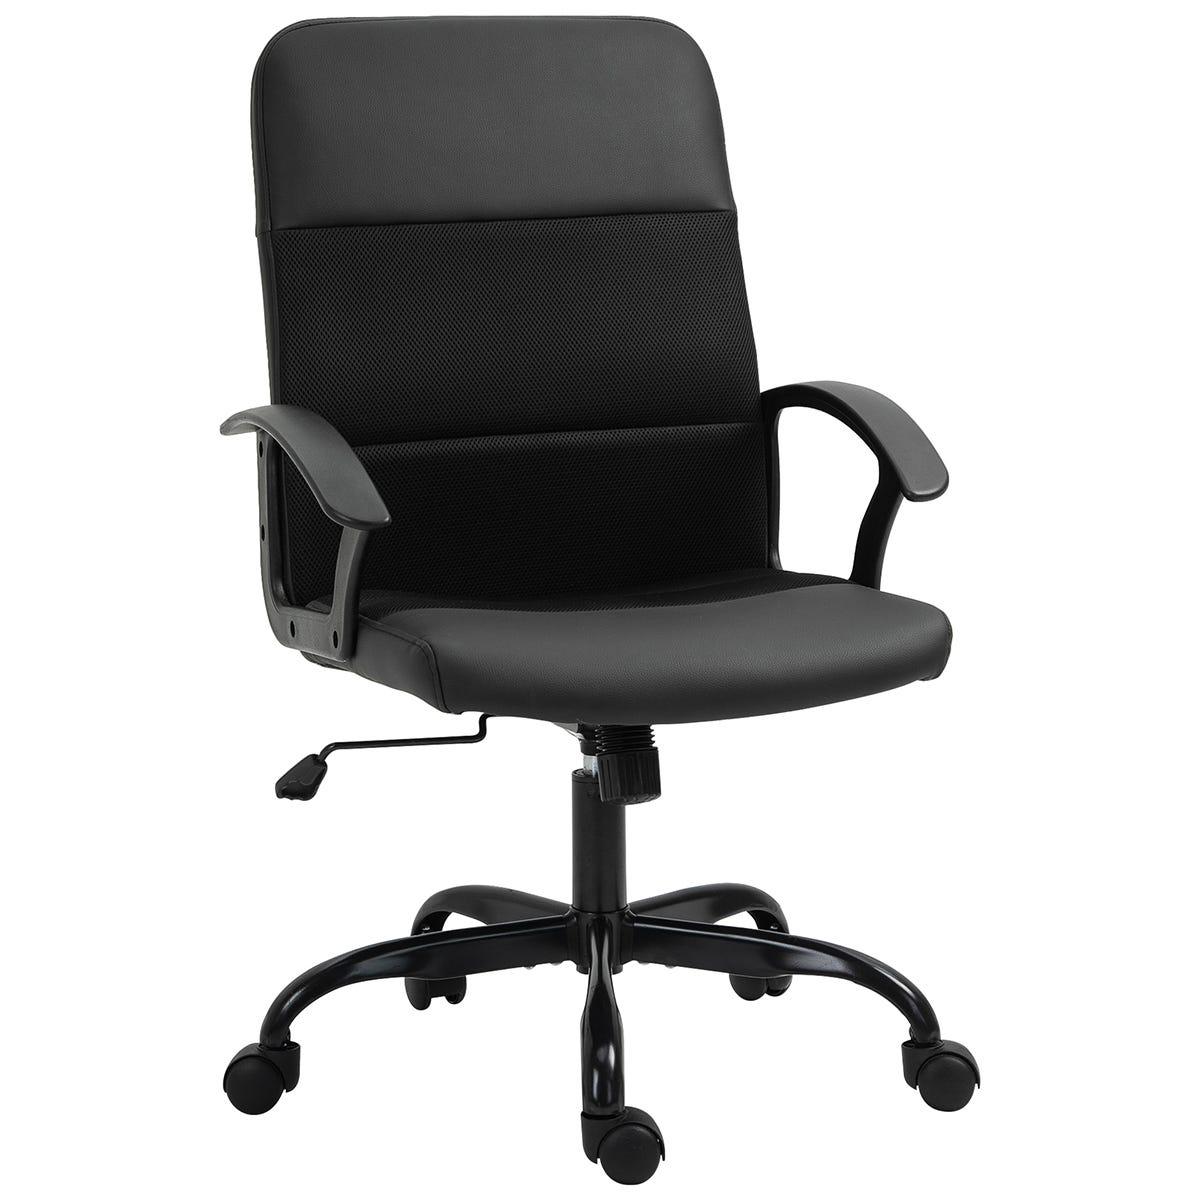 Zennor Kooj PVC Leather/Mesh Office Chair - Black